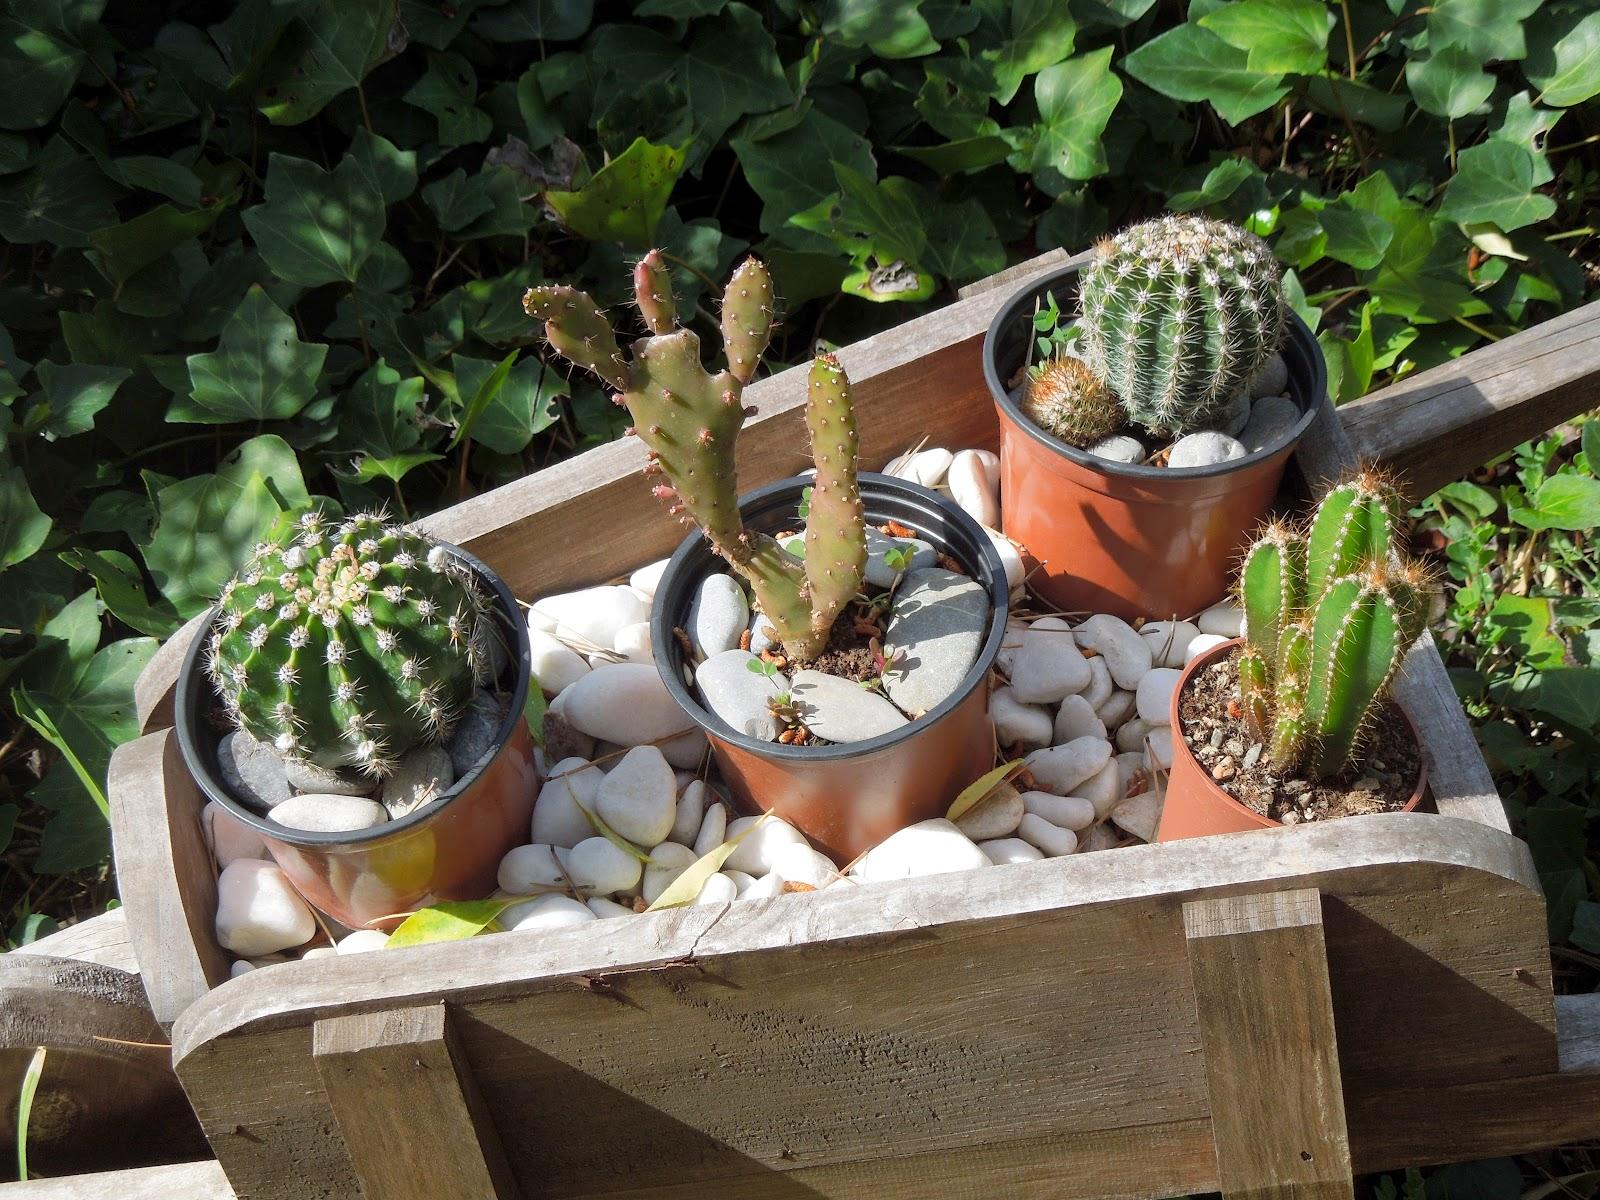 Carretilla de cactus bot nic serrat - Como decorar un estanque ...